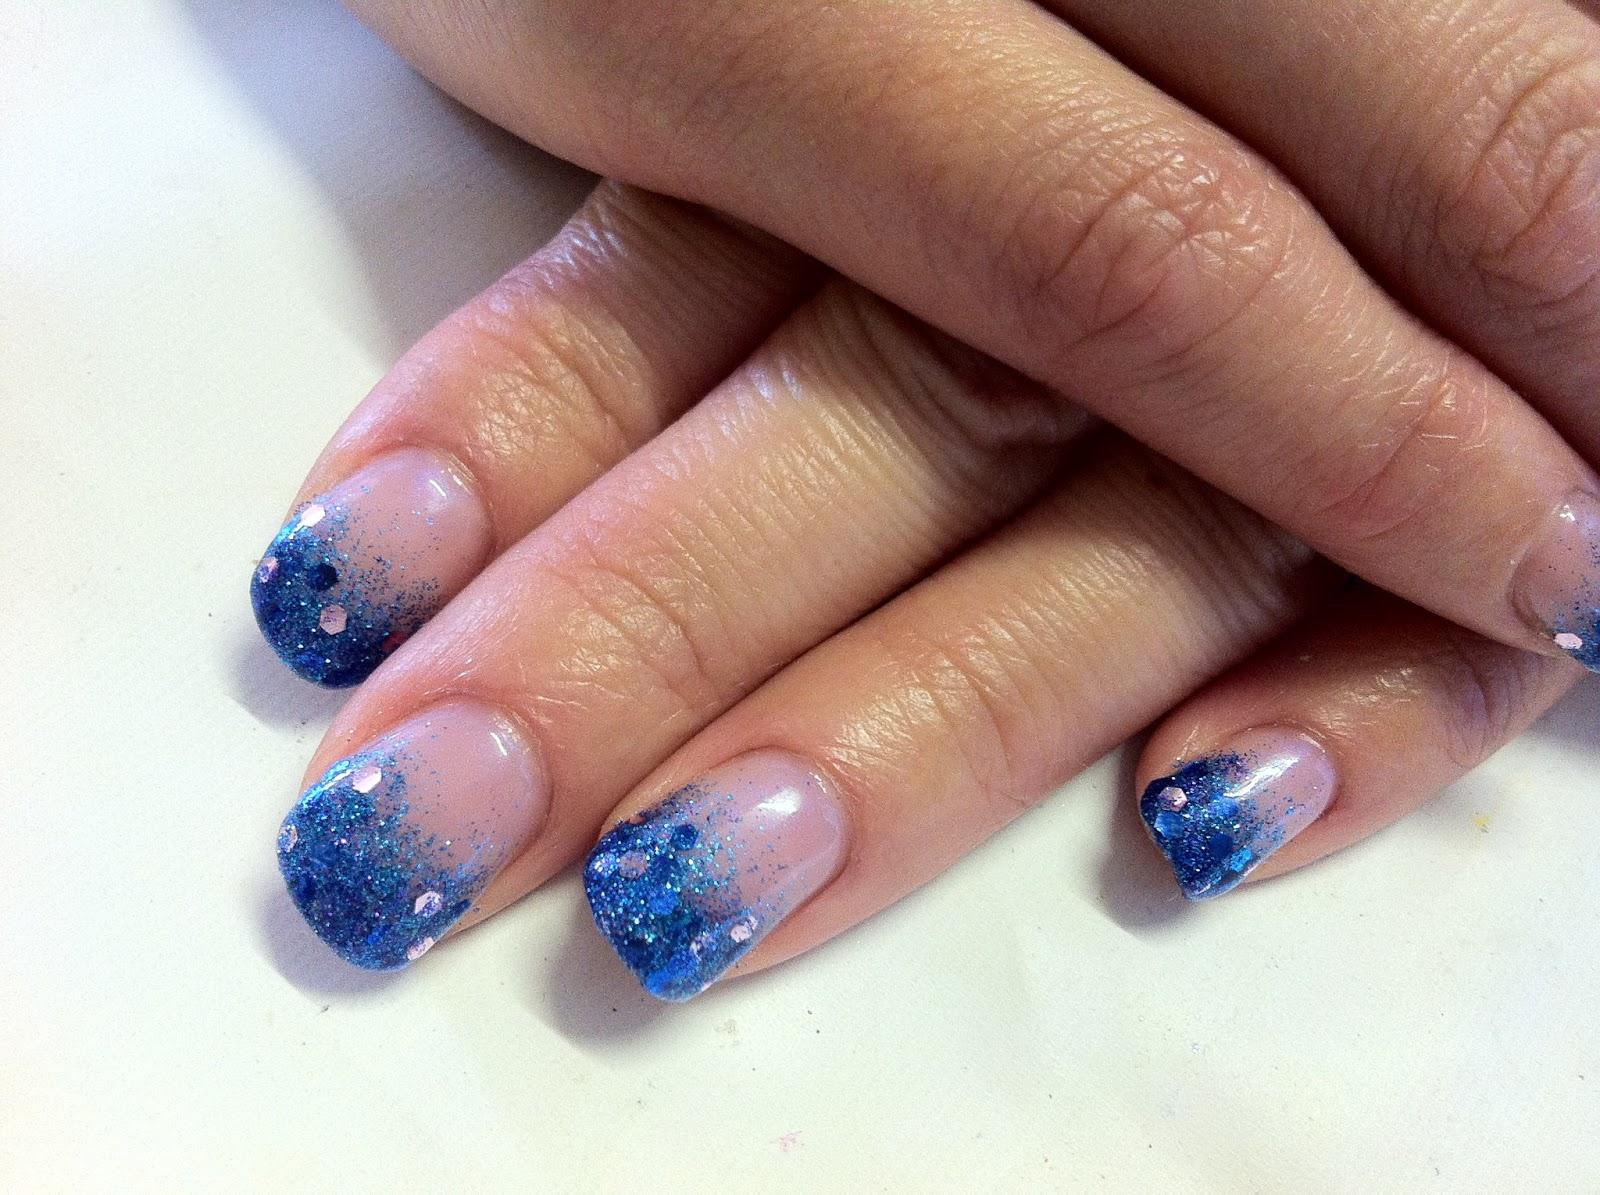 Dangers of gel nail polish - Awesome Nail